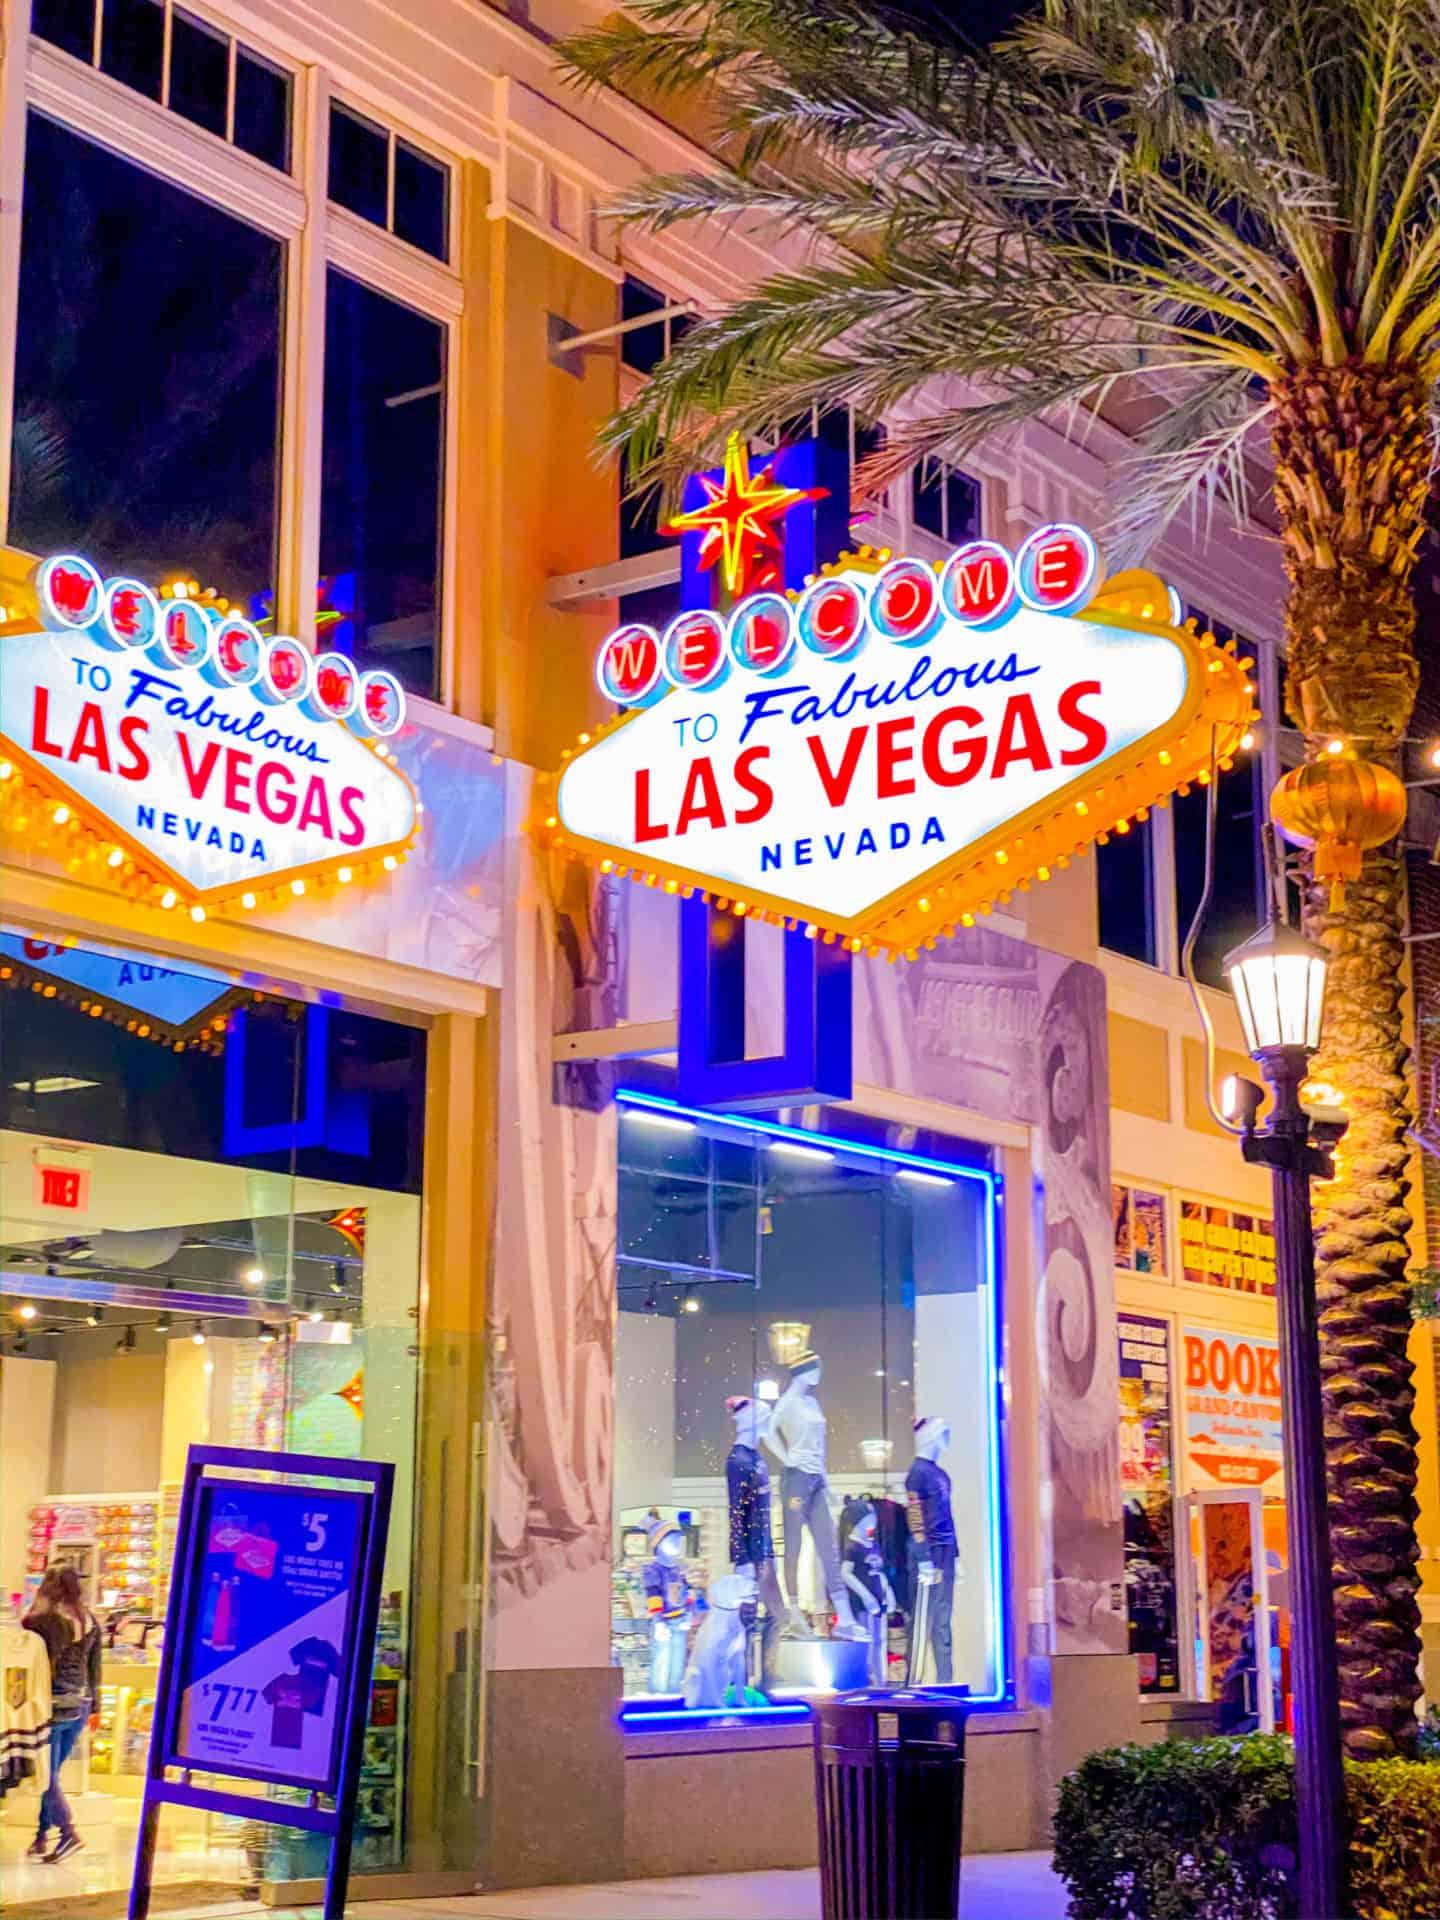 The ultimate Las Vegas travel guide book